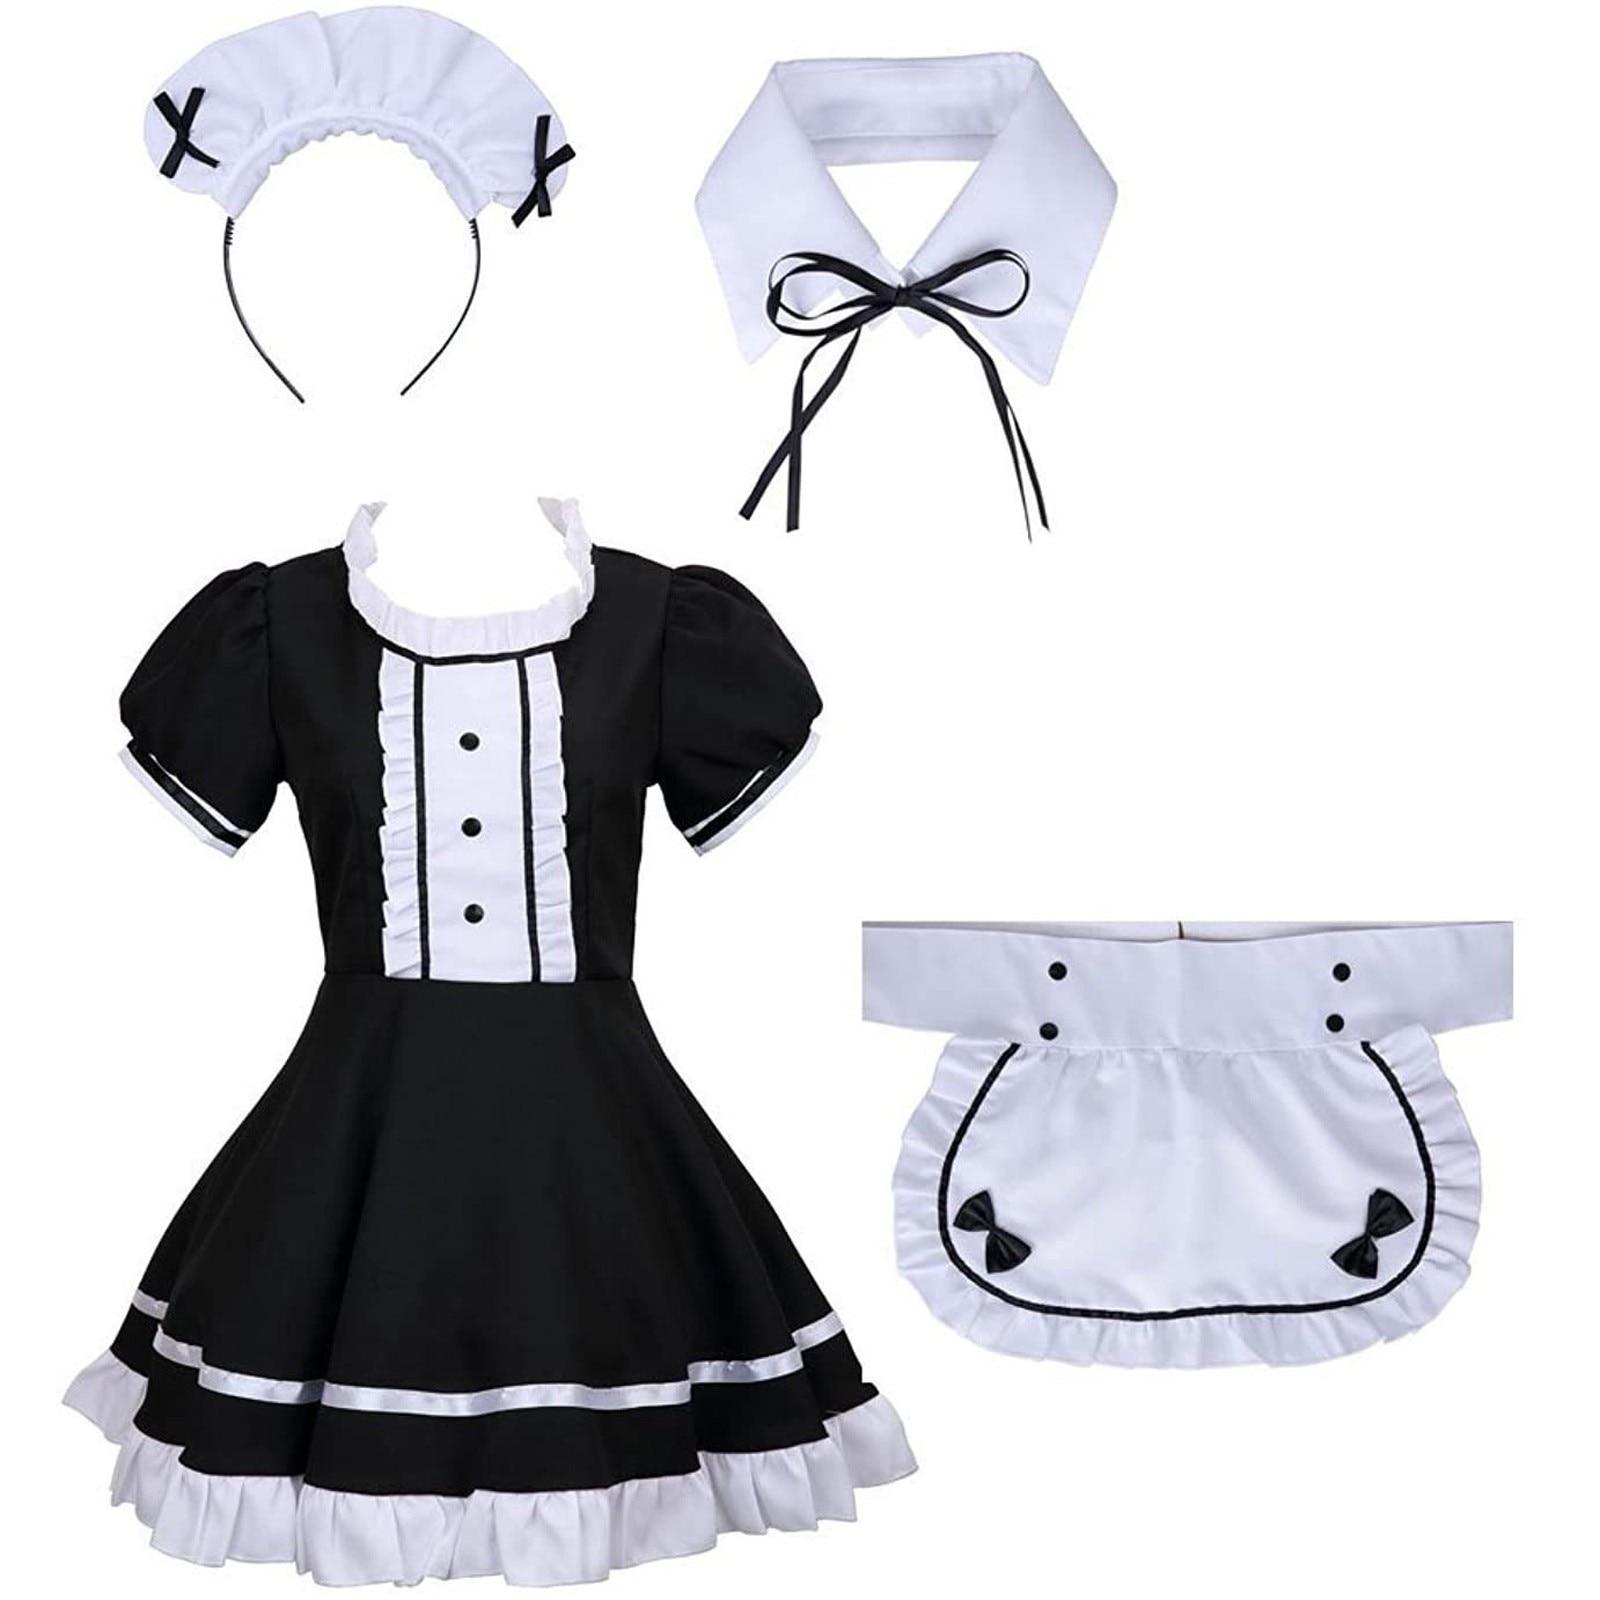 Apron fake collar bowknot dress babydoll underwear clothes underwear maid cosplay dress exotic